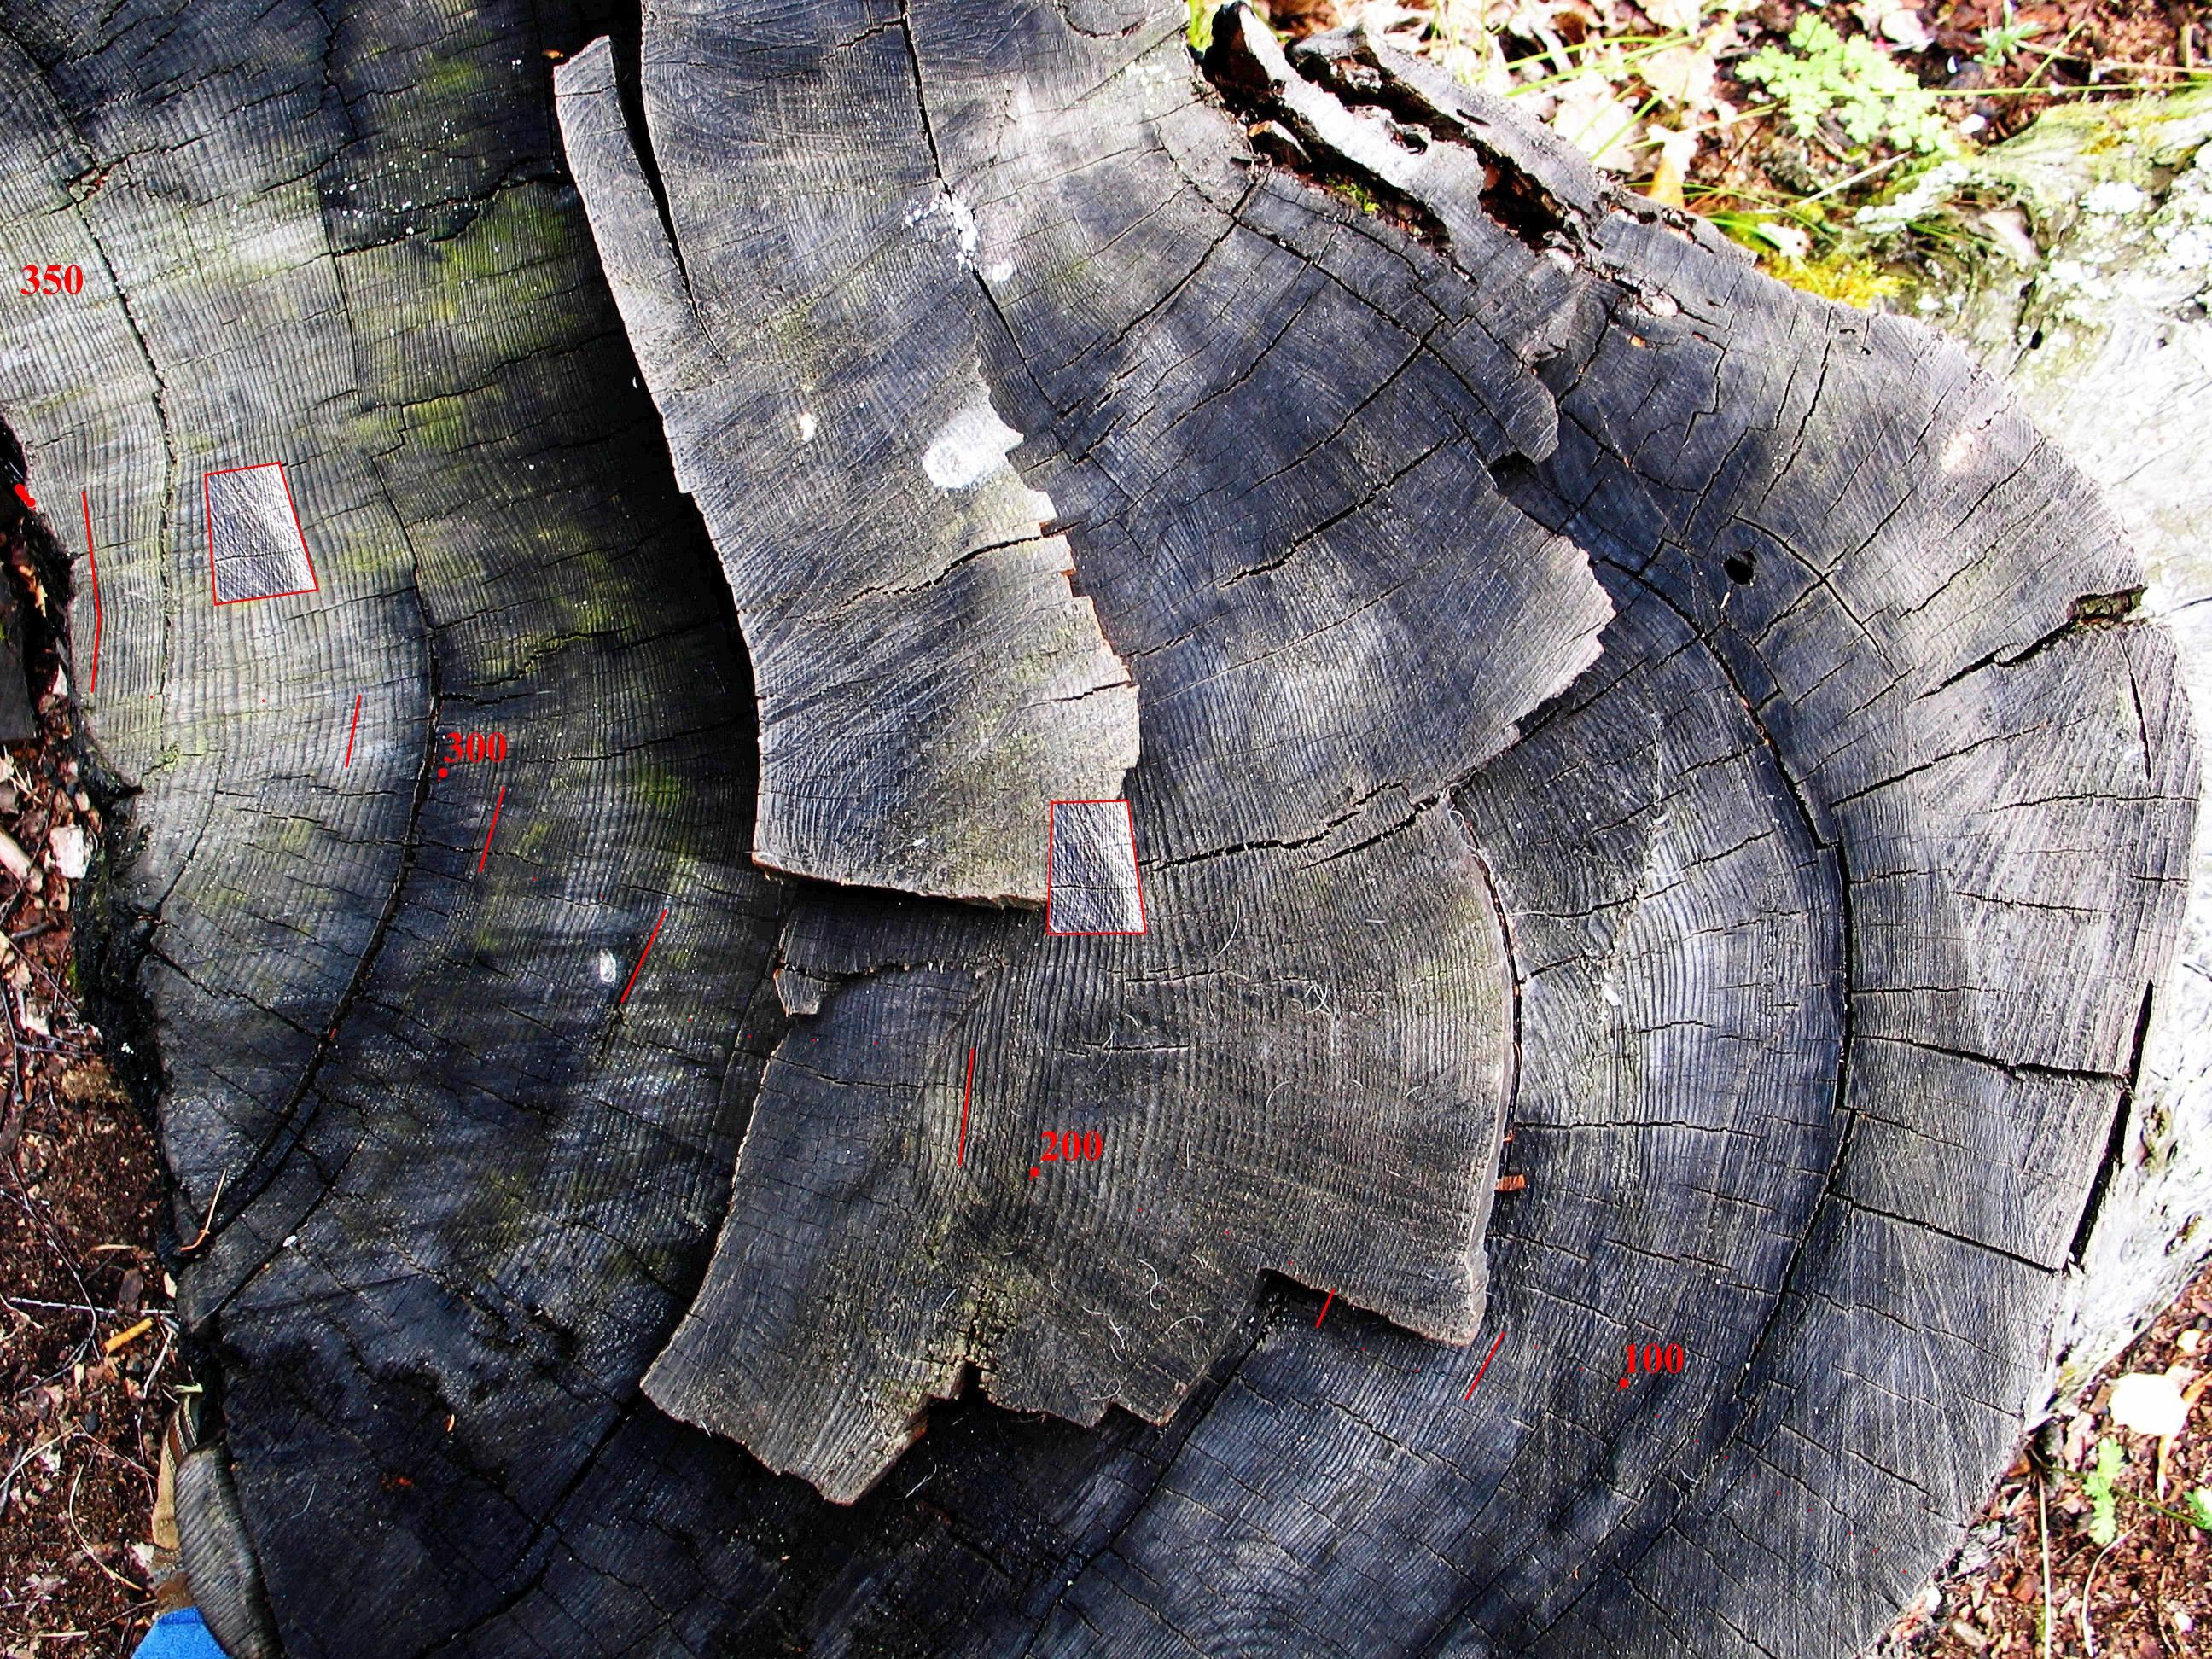 _дерево контраст_резк_счет_даты_уменьш